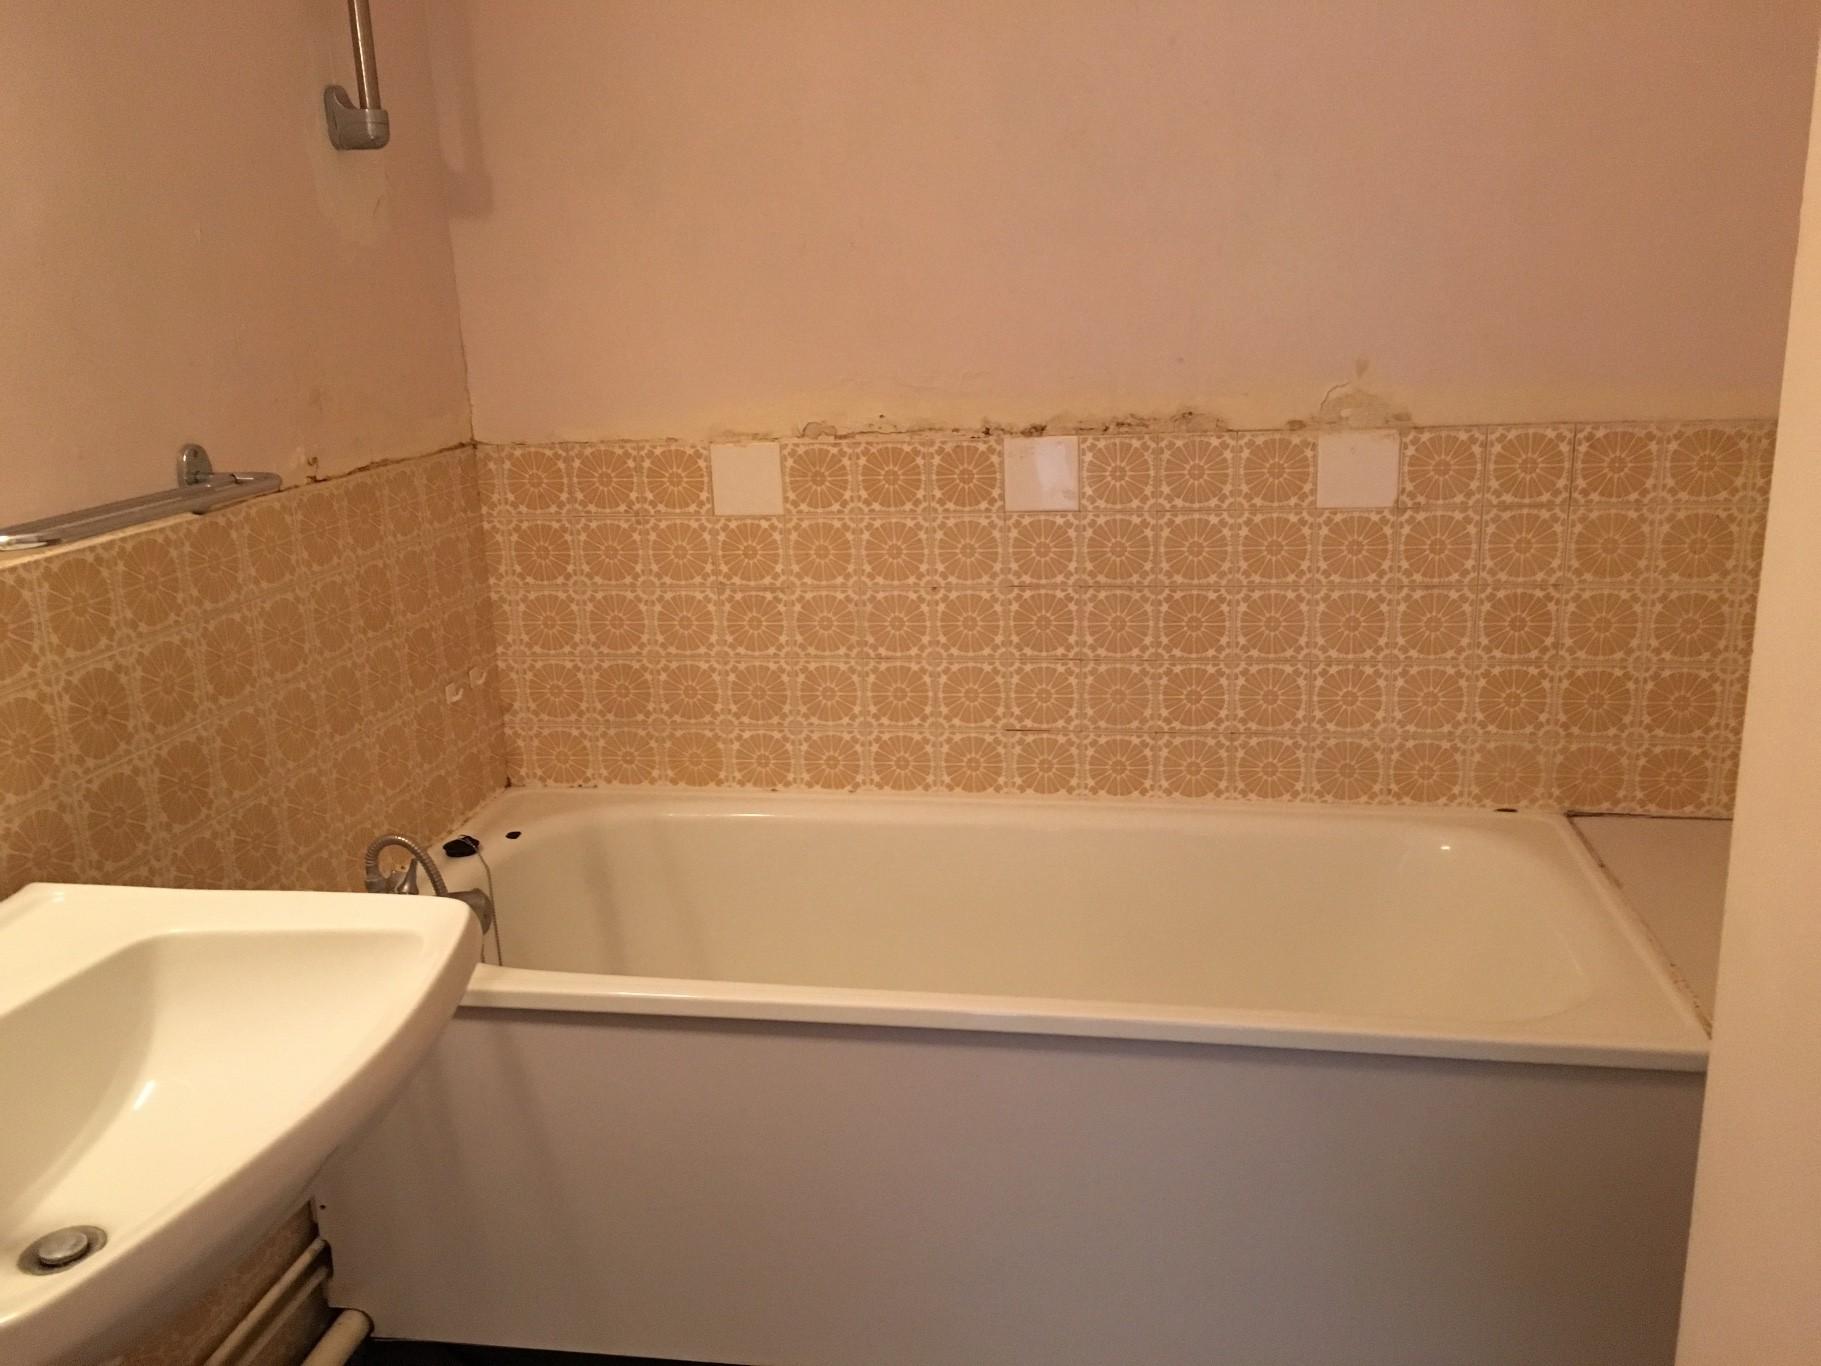 dijon fontaine d 39 ouche location appartement 1 pi ce 30m2 355 cc r f 16 110 154130. Black Bedroom Furniture Sets. Home Design Ideas